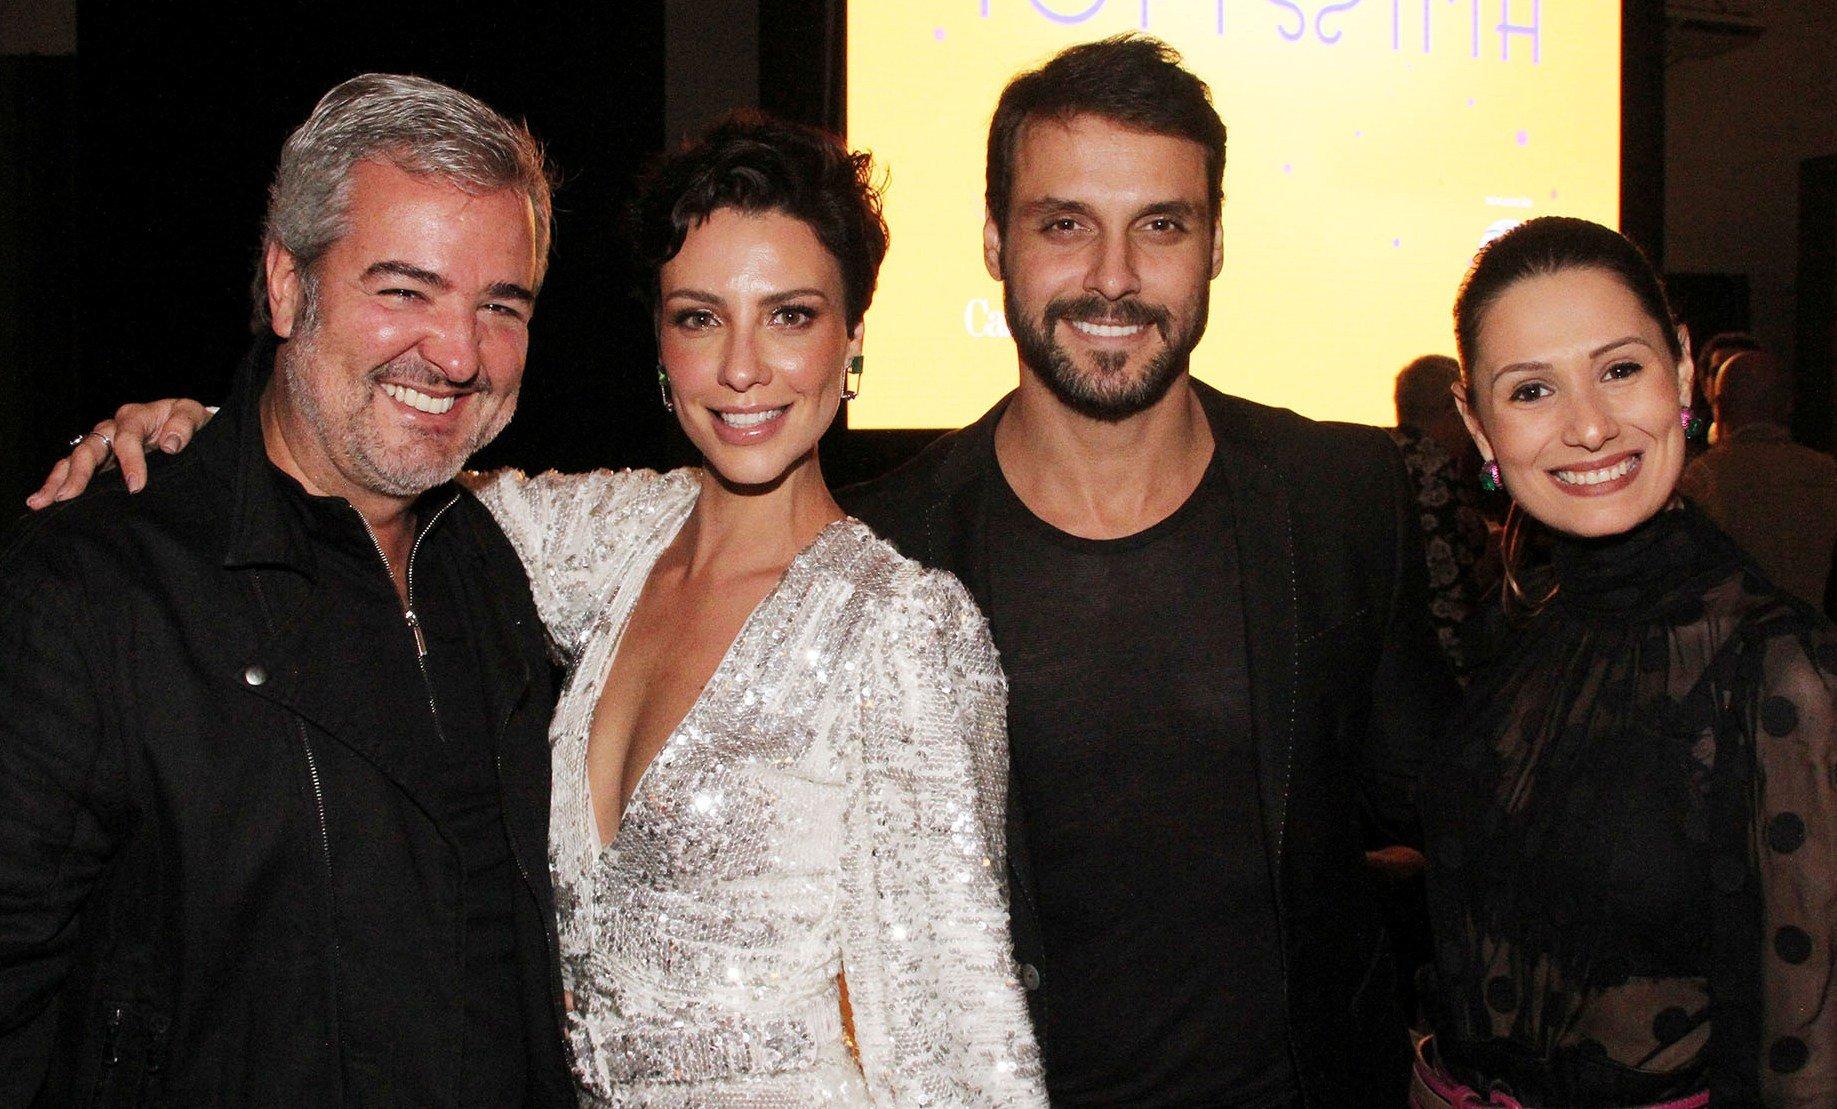 Thomaz Naves , Camila Rodrigues, Felipe Cunha e Camilla Carvalho / Foto: Paulo de Deus